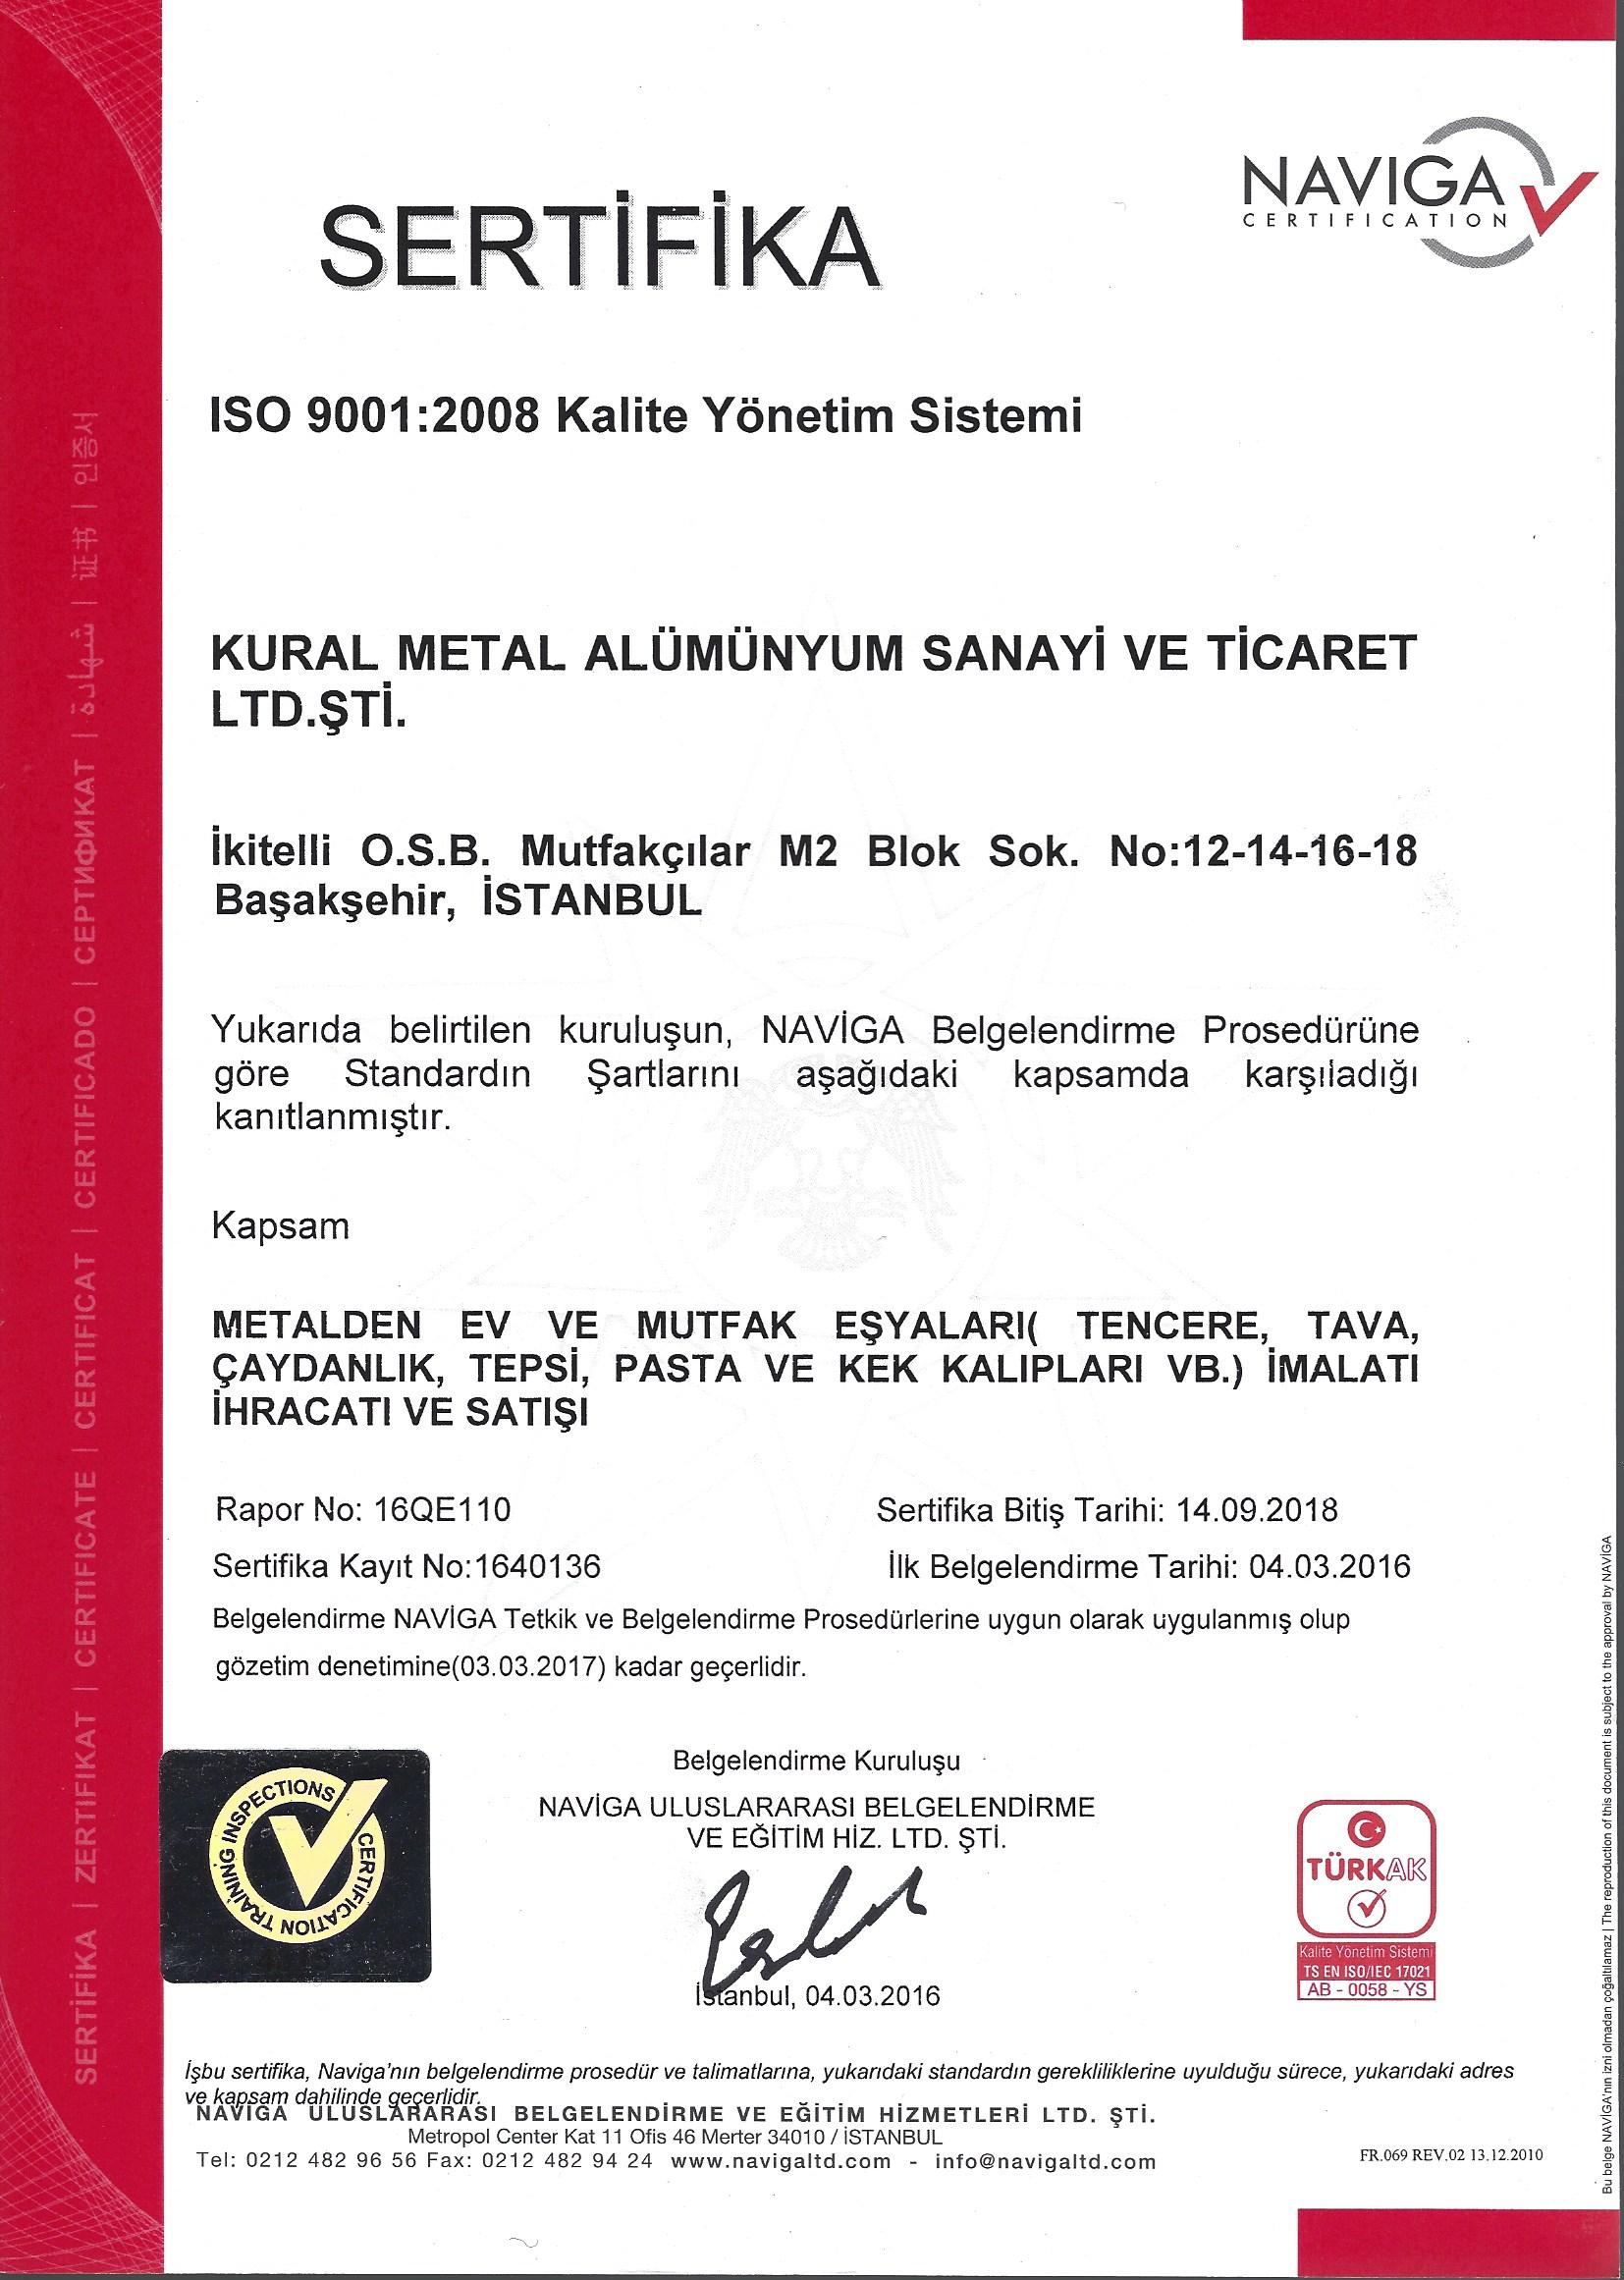 Brioni ISO 9001:2008 Kalite yonetim sistemi sertifikasi